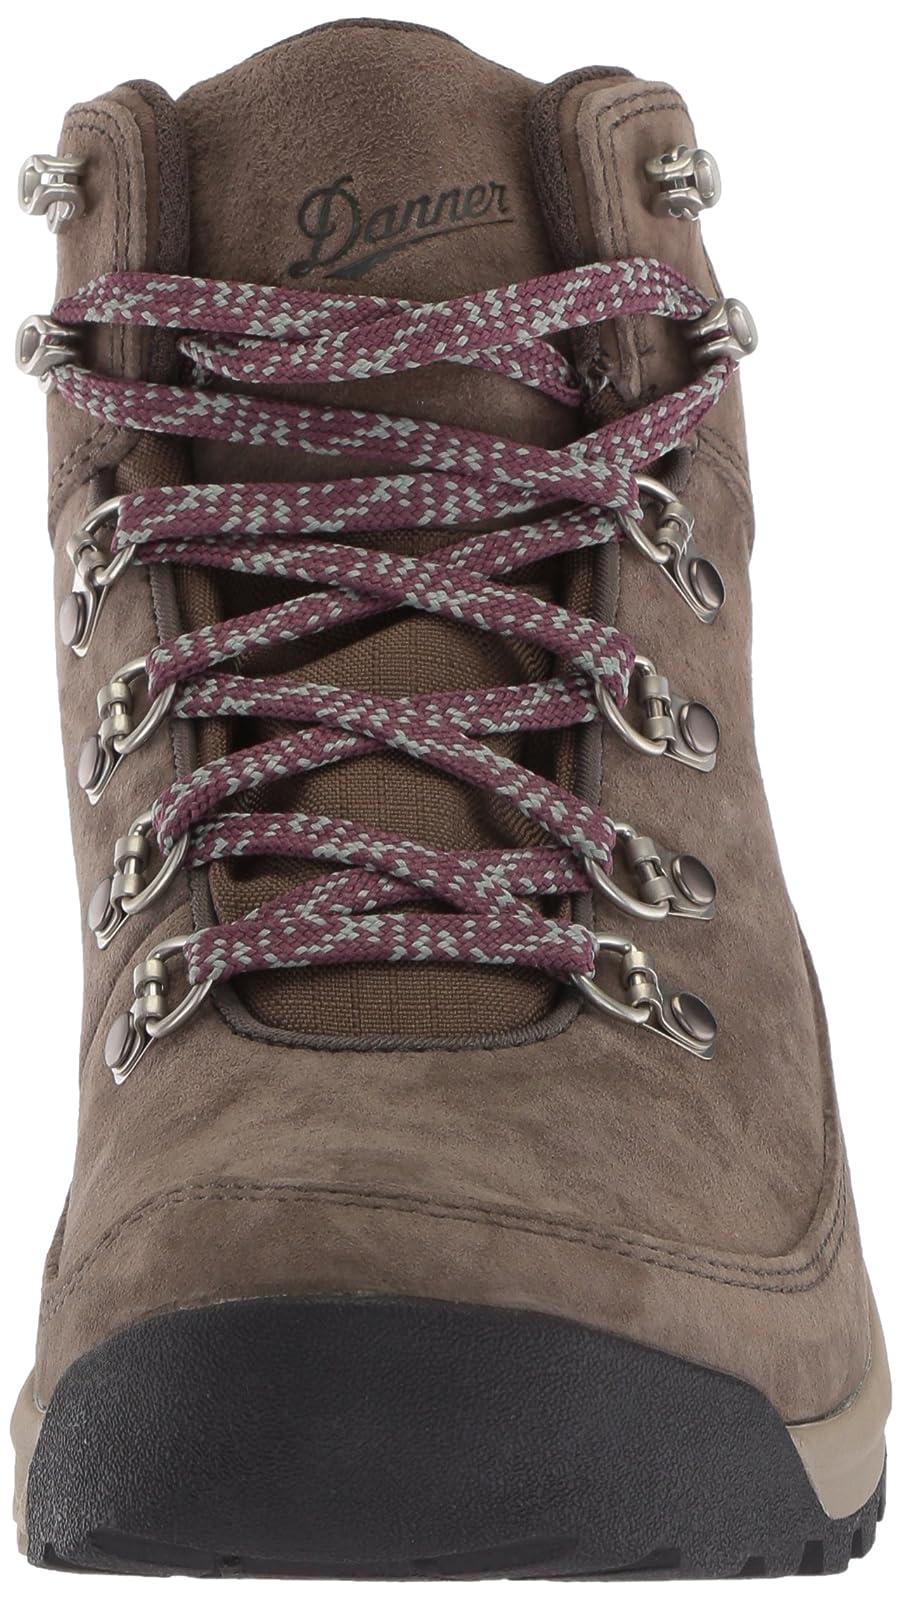 Danner Women's Adrika Hiker Hiking Boot 2 M US Boy - 4